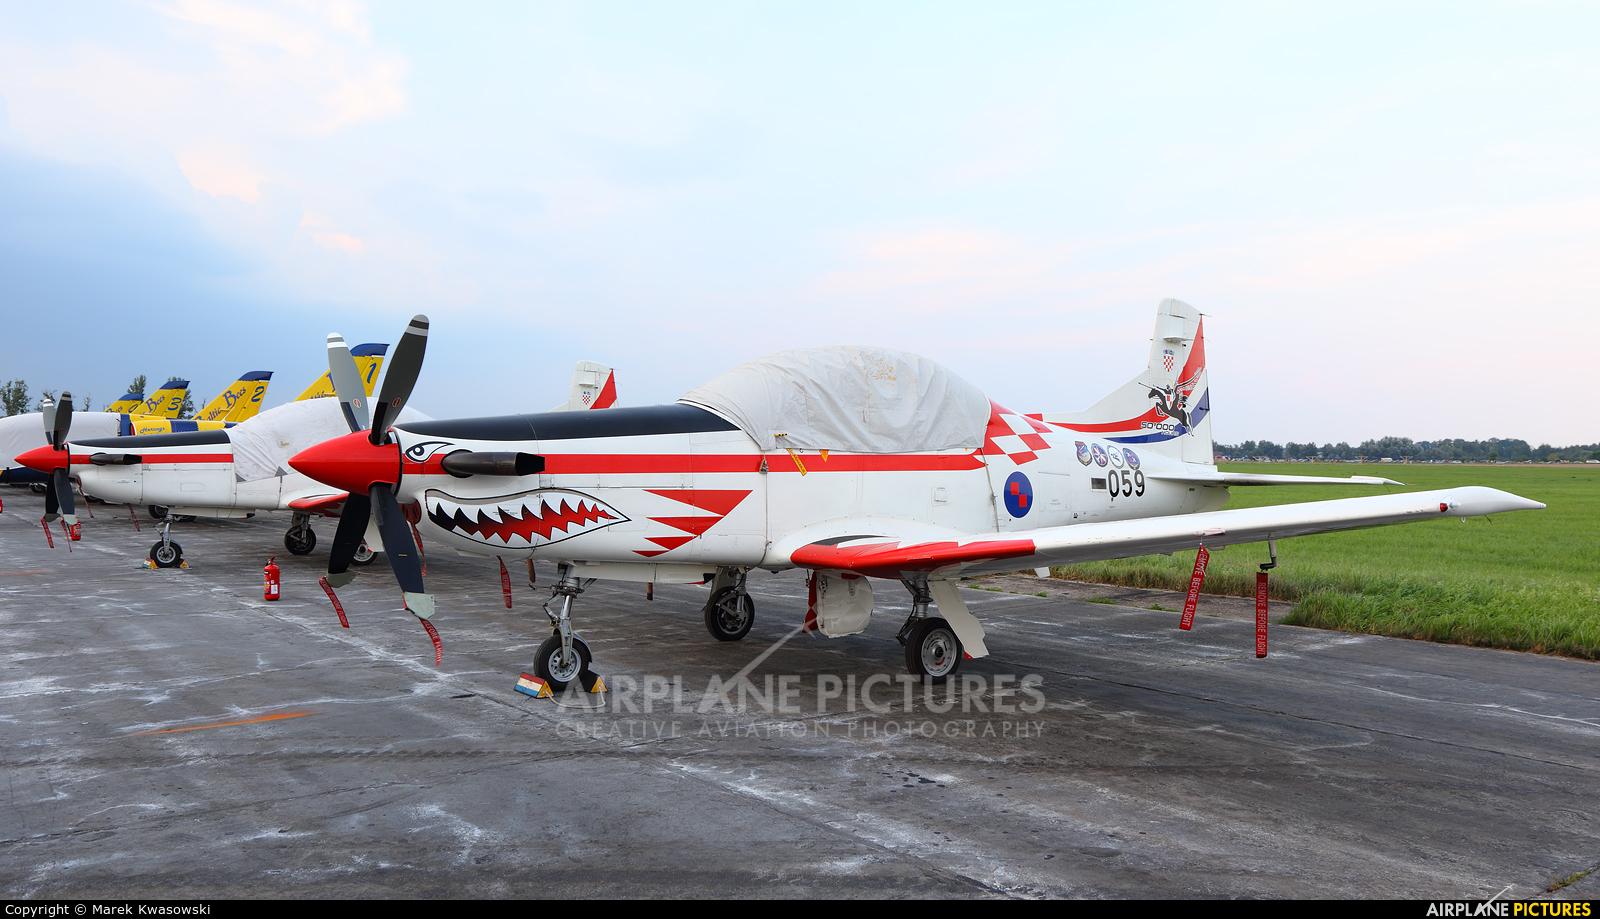 Croatia - Air Force 059 aircraft at Radom - Sadków